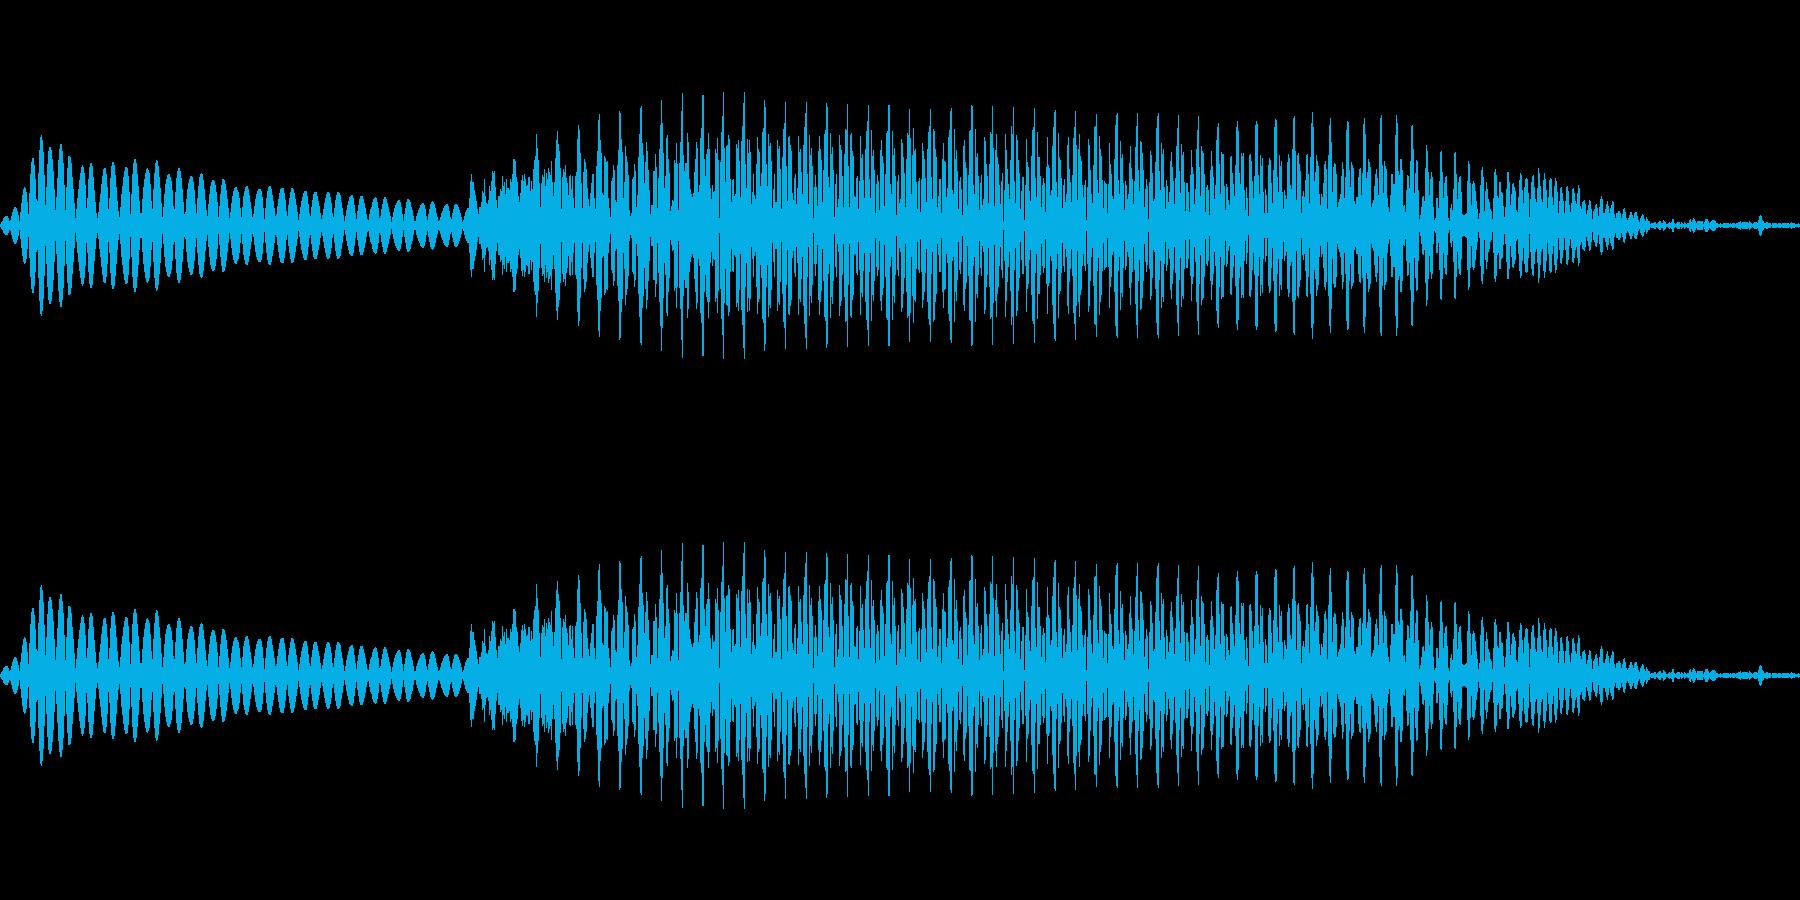 due(2) ドゥ フランス語 女性の再生済みの波形